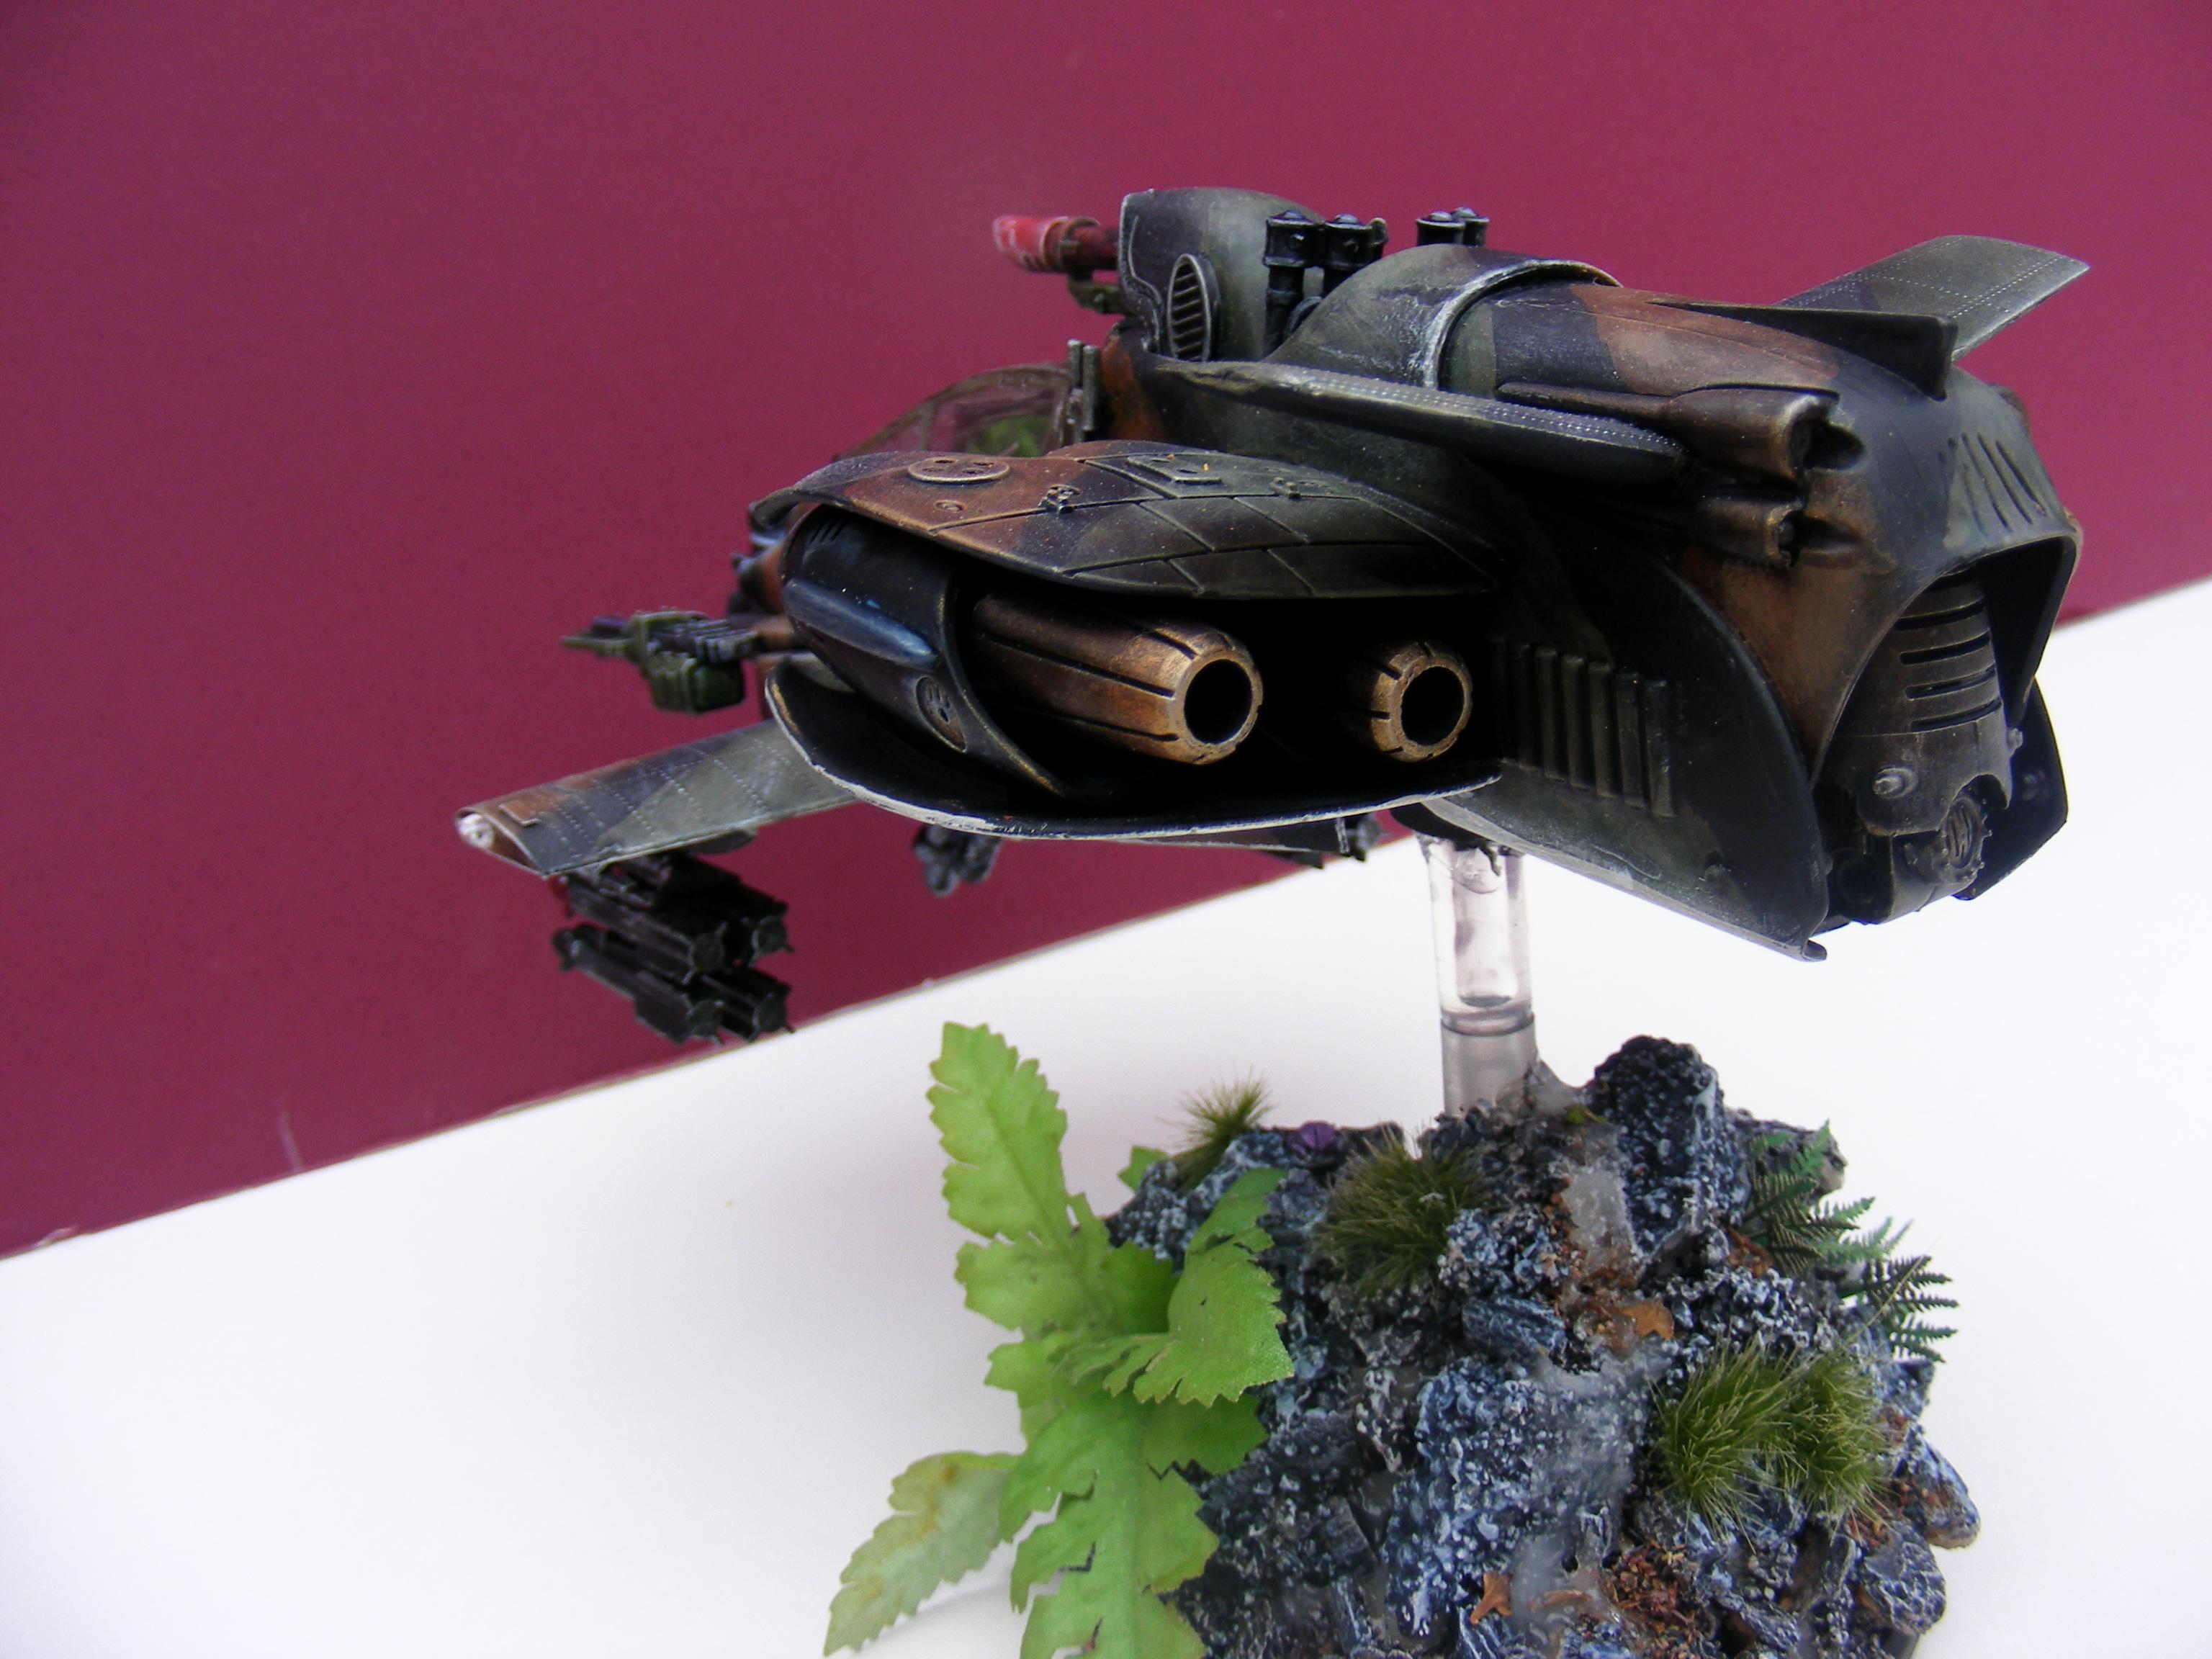 Flyer, Imperial Guard, Valkerie, Vulcan, Vulture